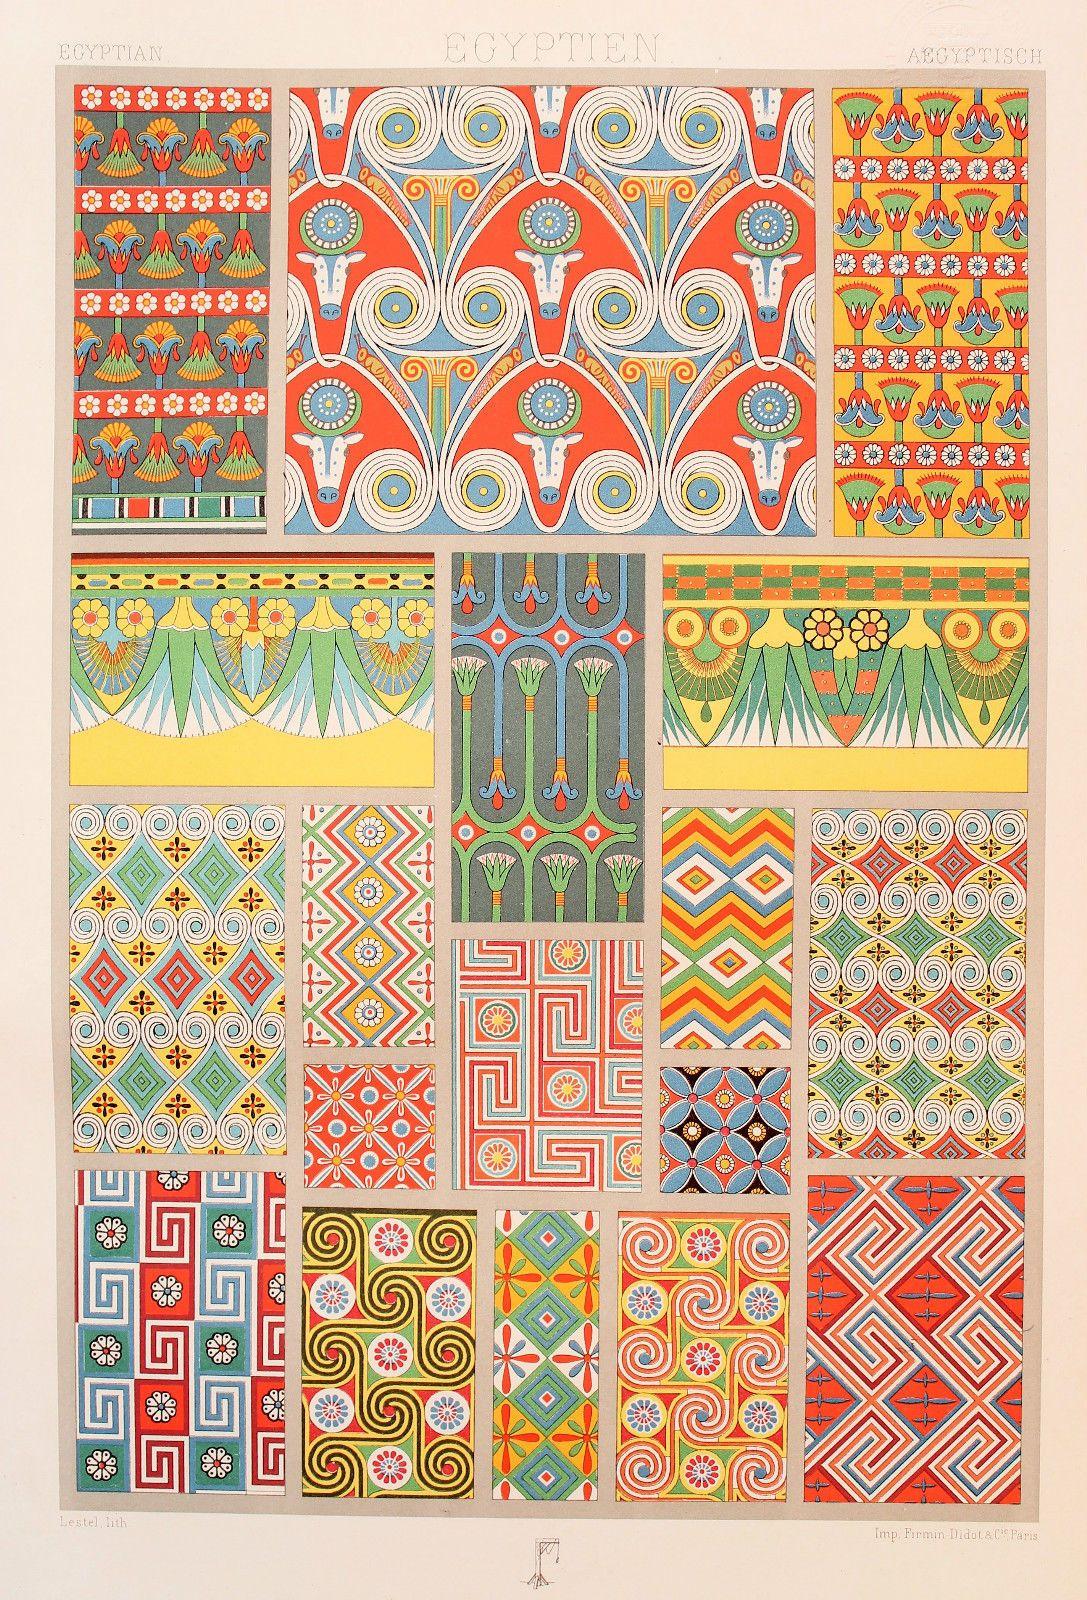 Racinet egyptian decorative ornament 1880s original - Decoraciones gramar ...